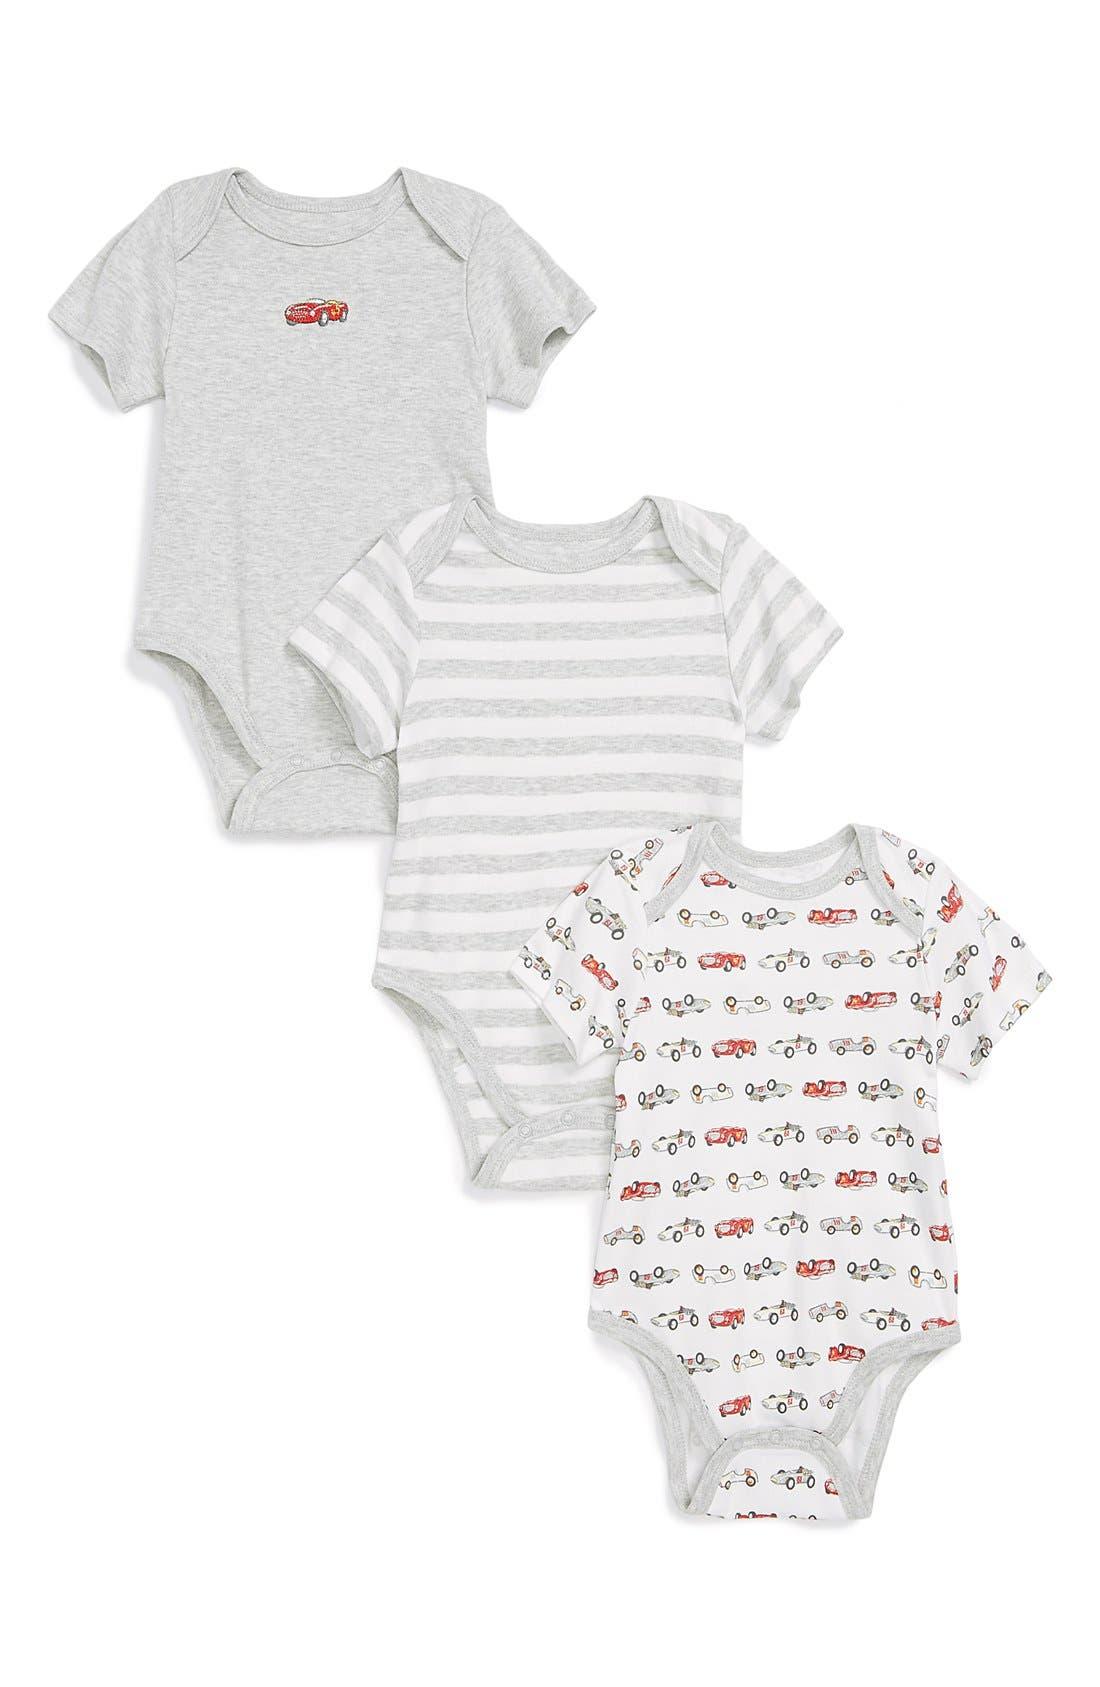 Alternate Image 1 Selected - Little Me 'Race Car' Bodysuits (Set of 3) (Baby Boys)